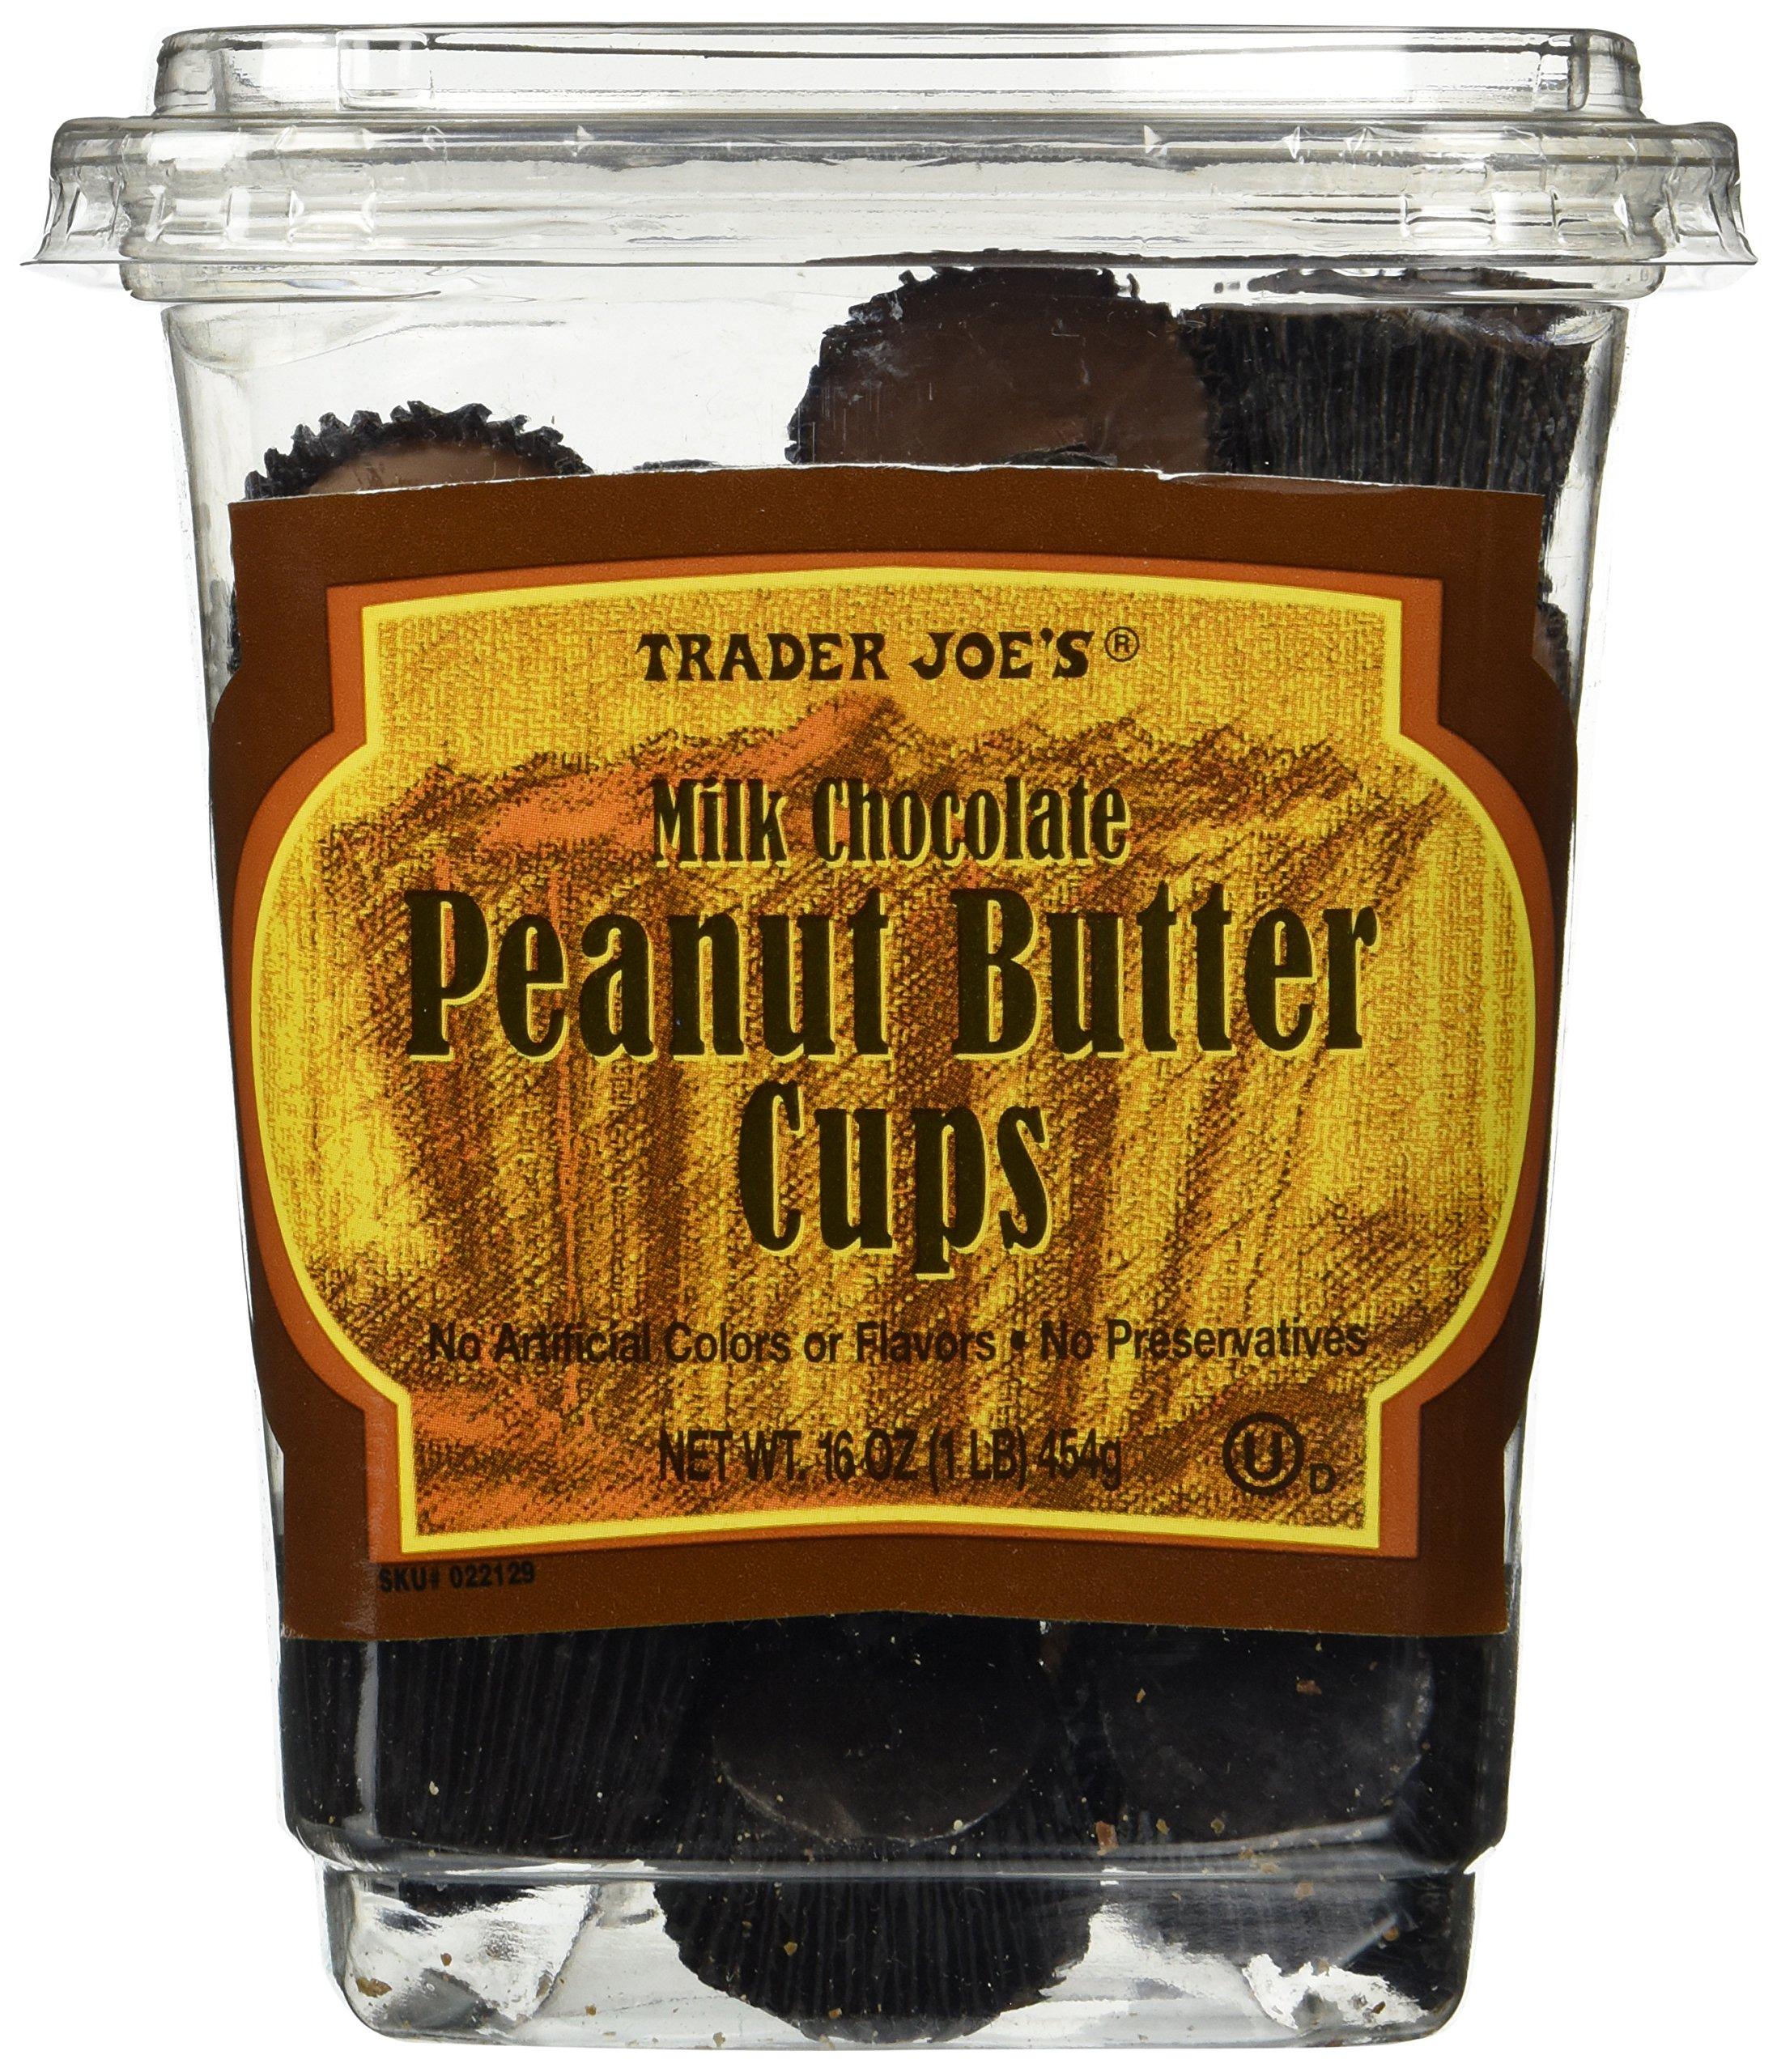 Trader Joe's Milk Chocolate Peanut Butter Cups 16 OZ(1 LB) by Trader Joe's